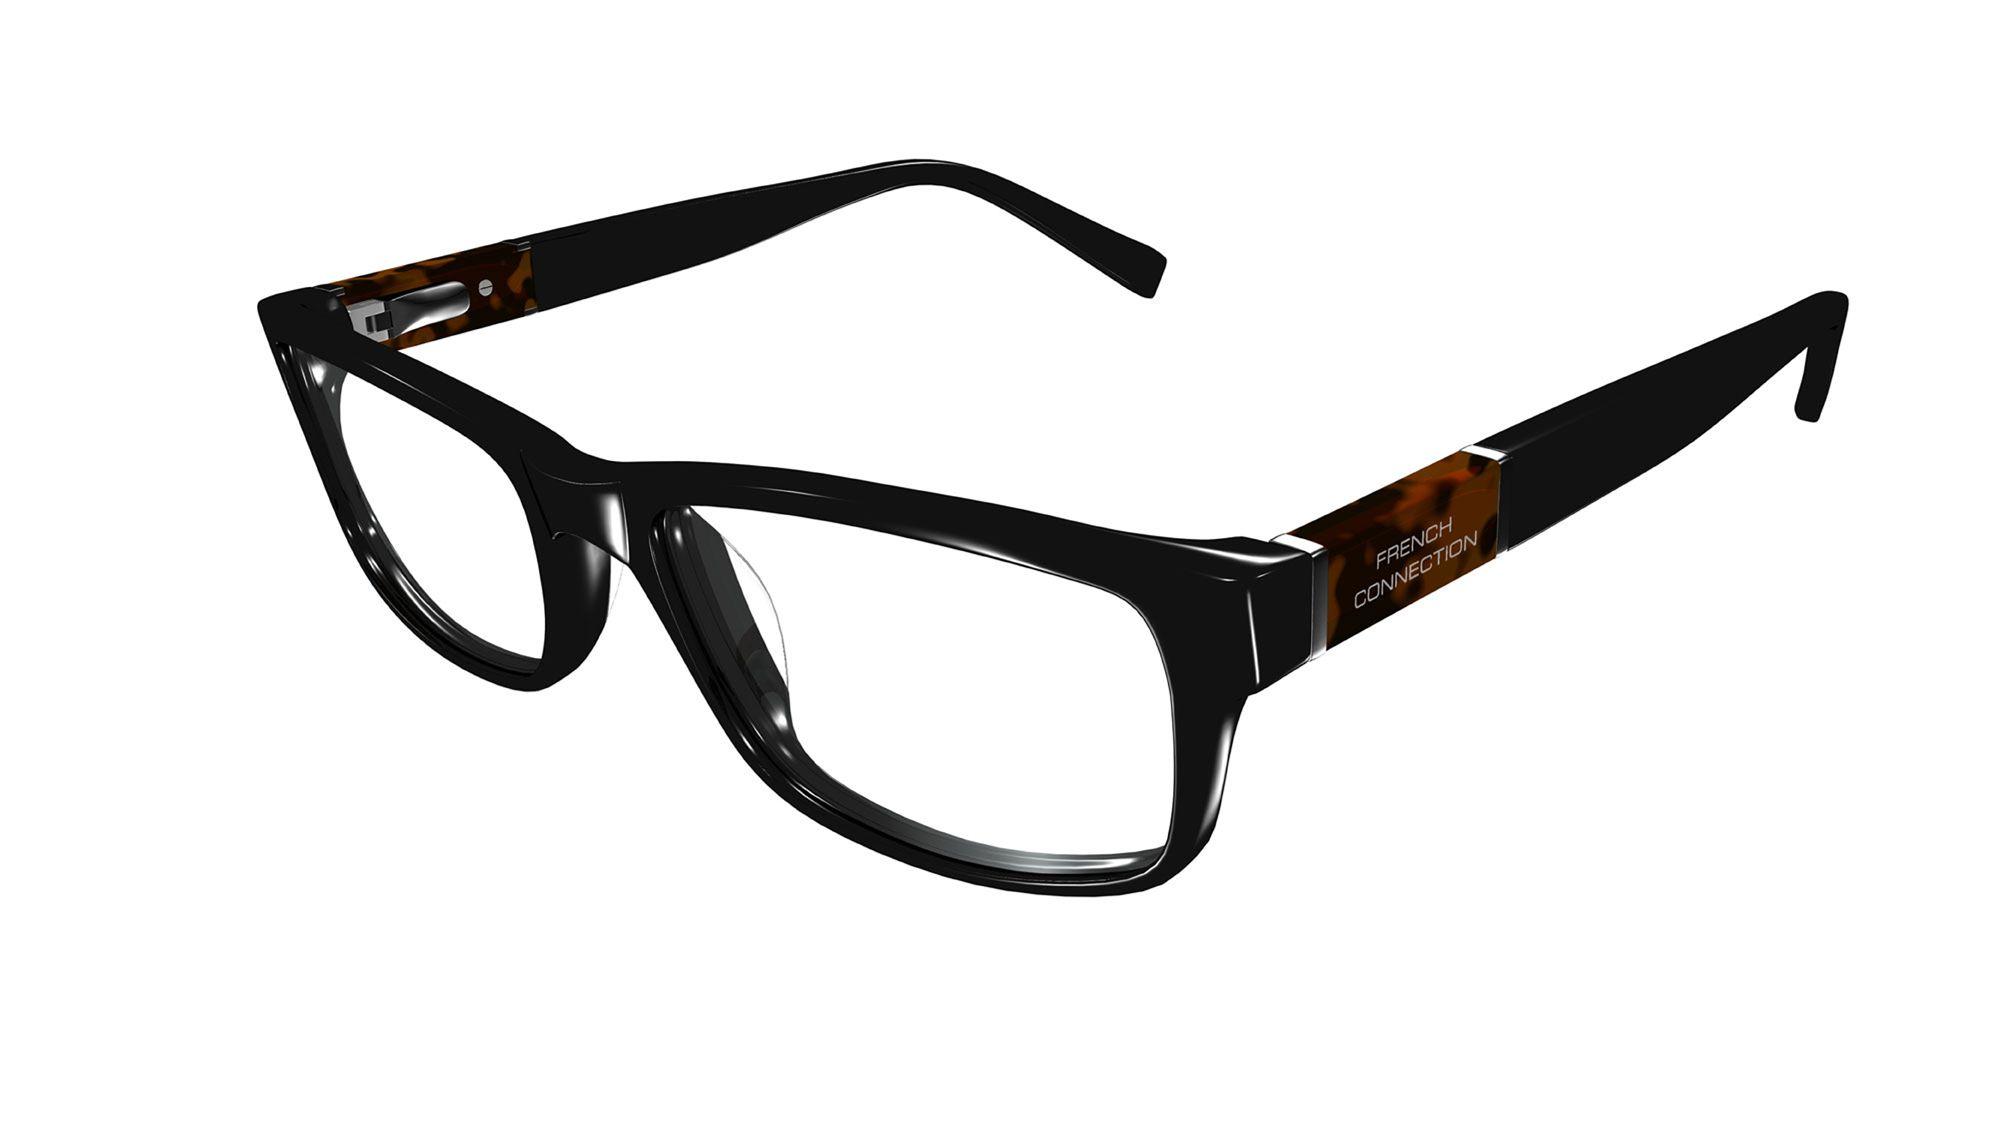 2400b5a85dfd Specsavers Optometrists - Designer Glasses